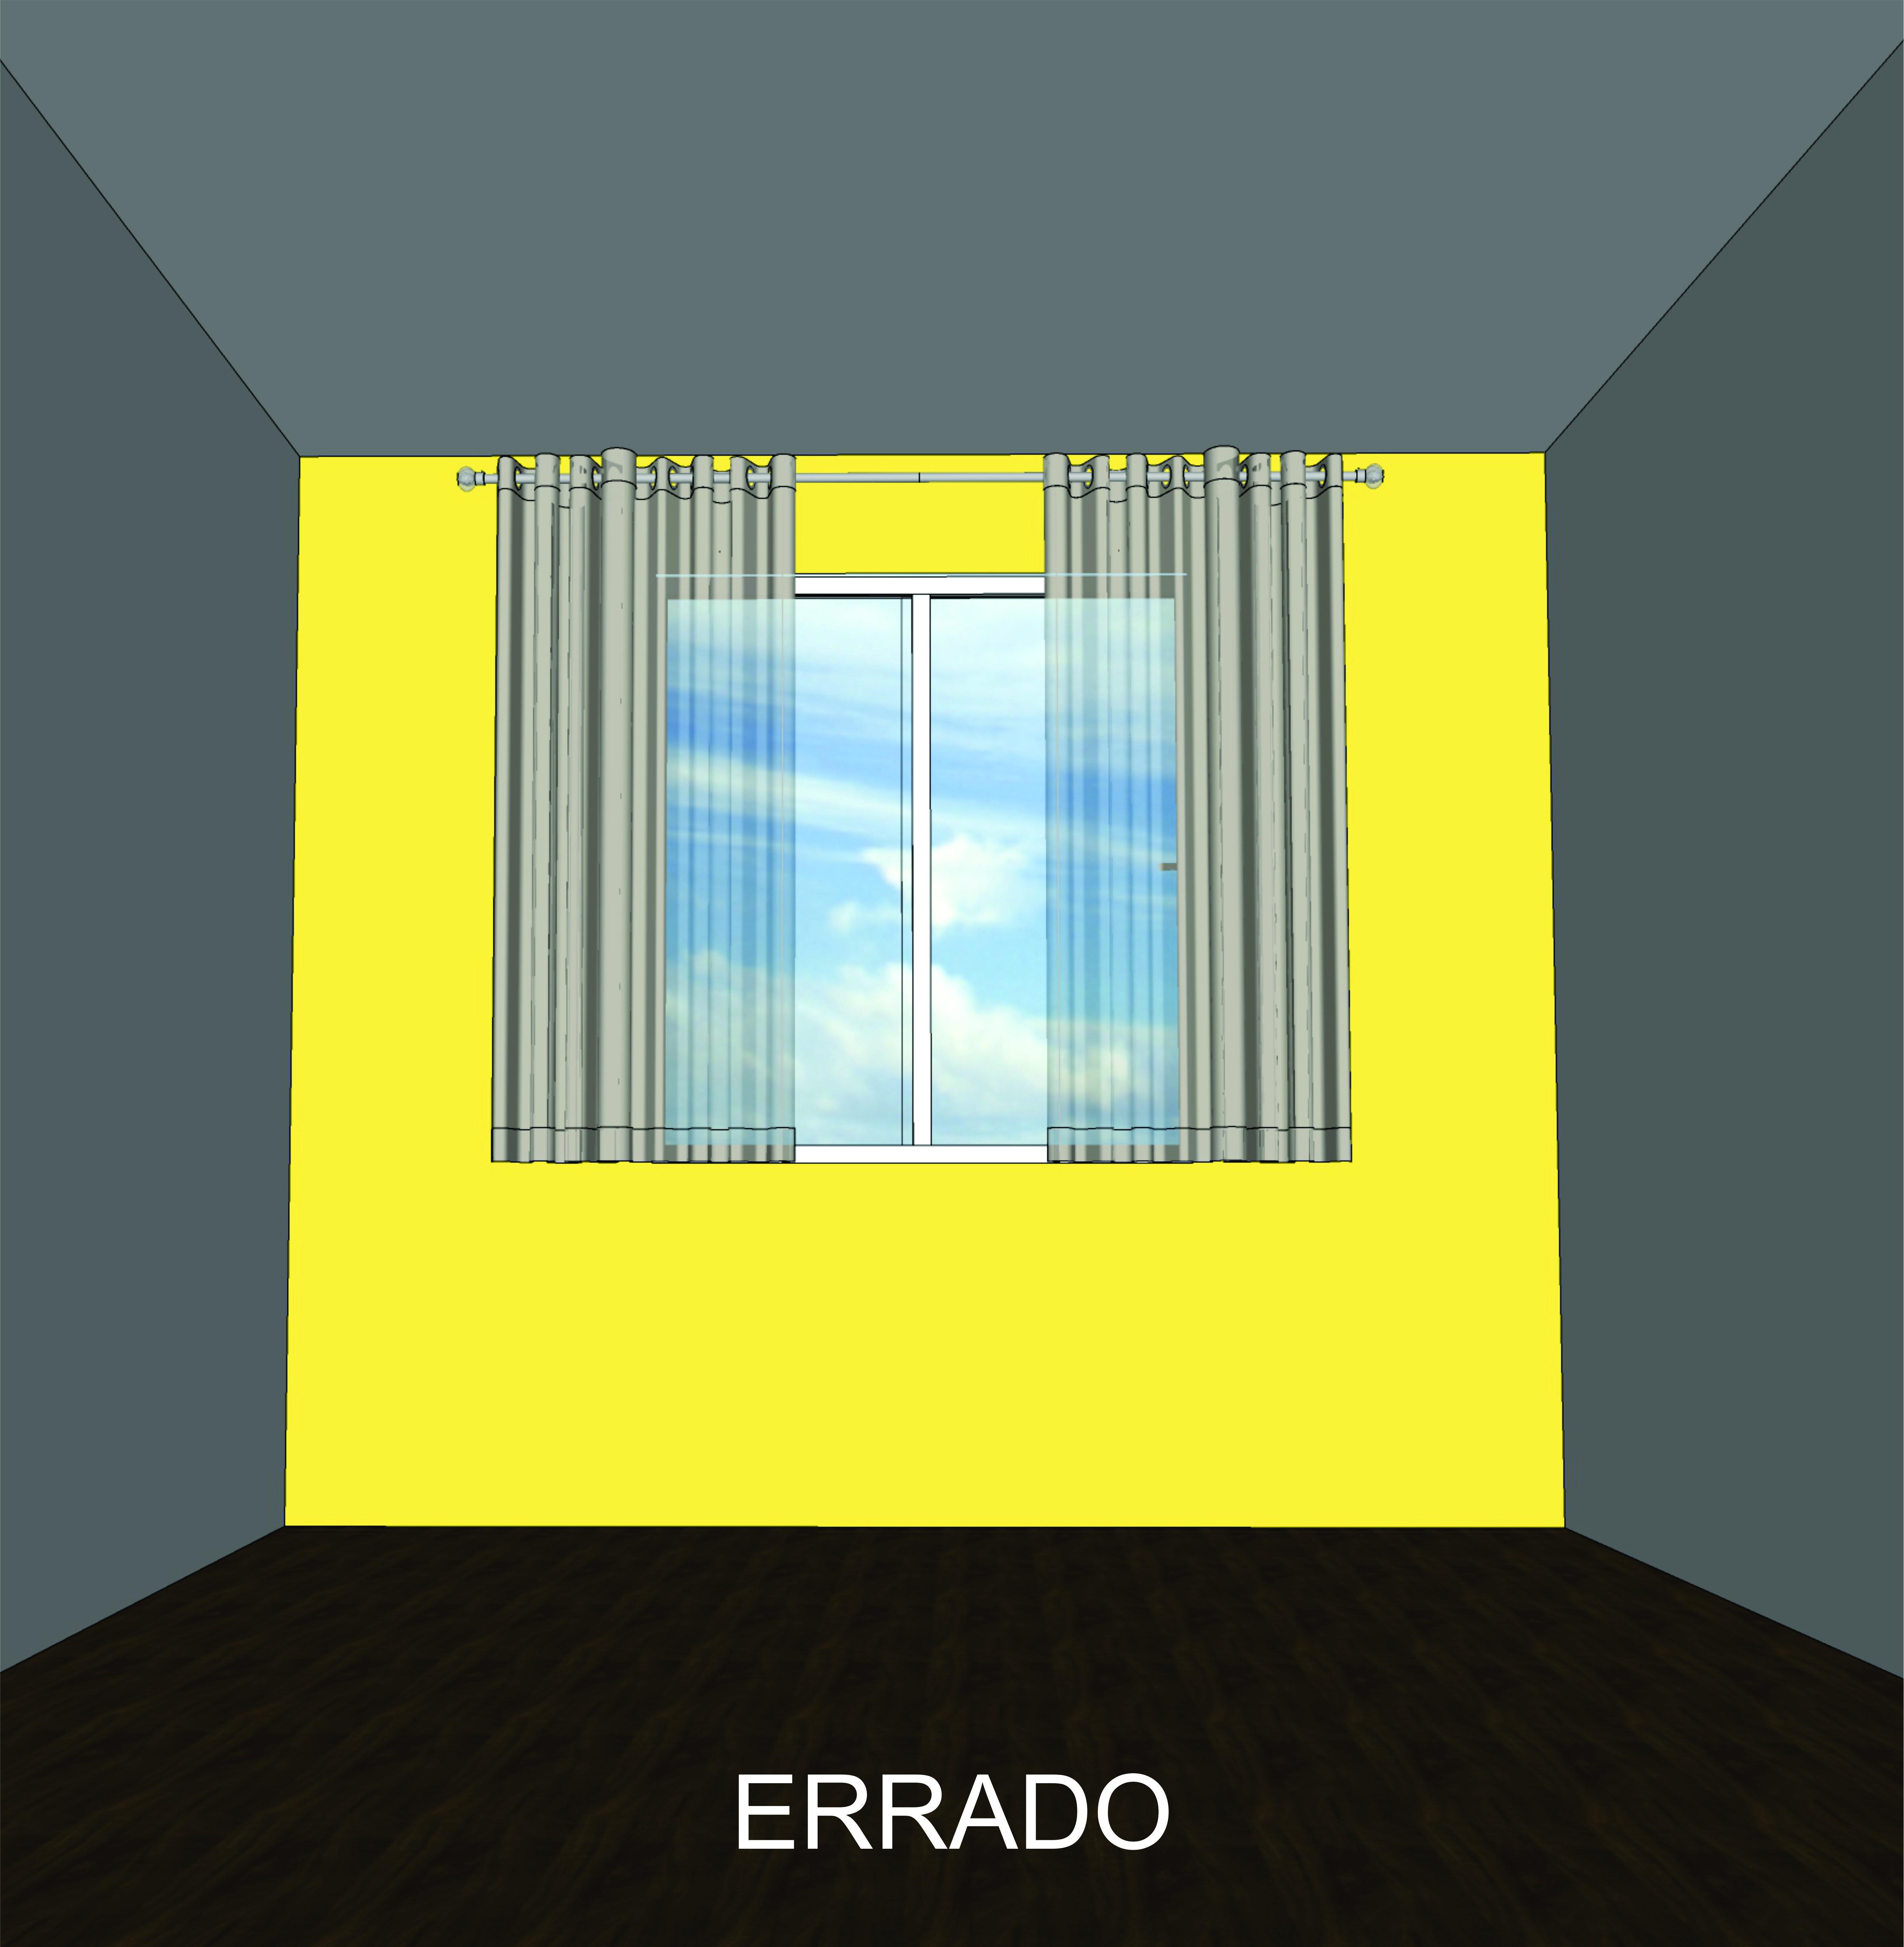 Altura Ideal Para Cortinas Arquitetura Curitiba Projete J